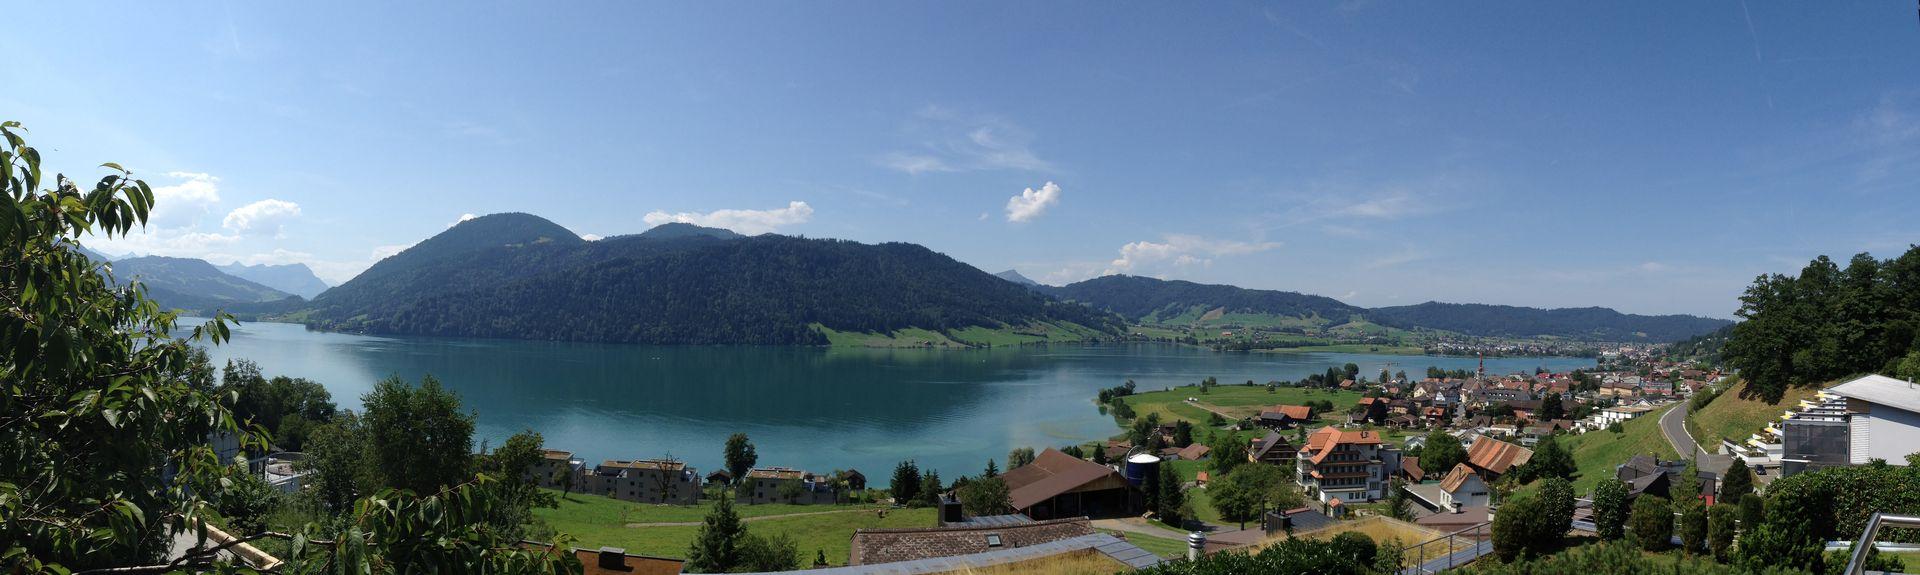 Uster Station, Switzerland